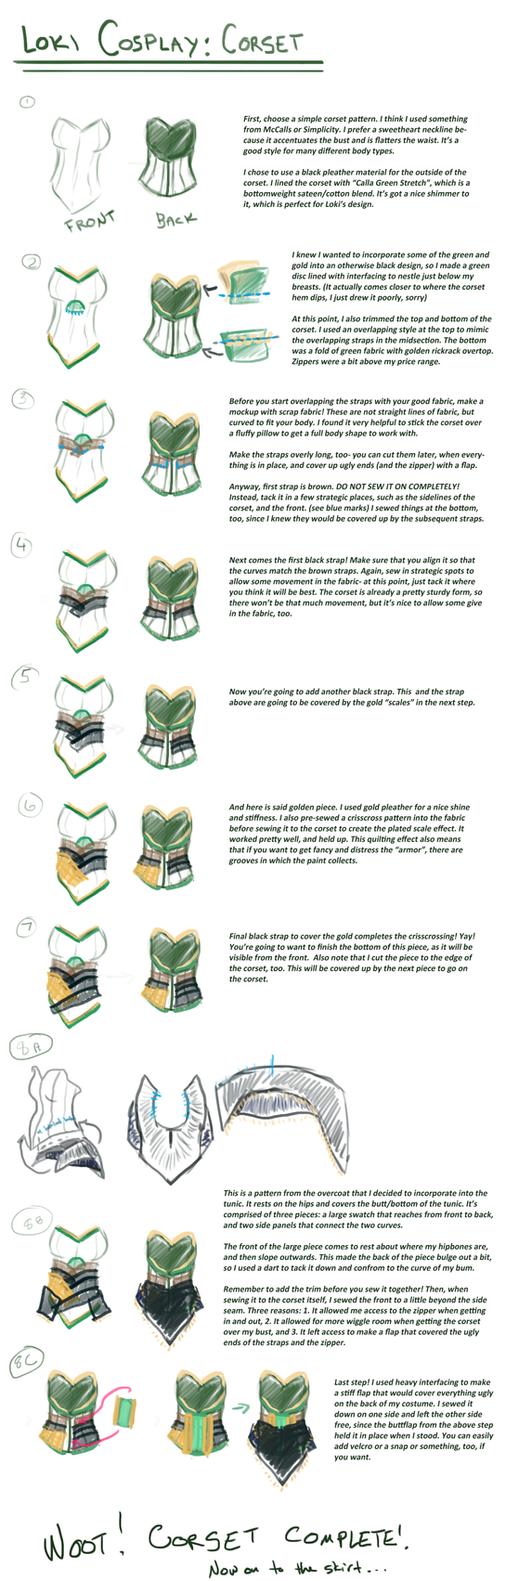 Loki cosplay guide: Corset by SirLadySketch